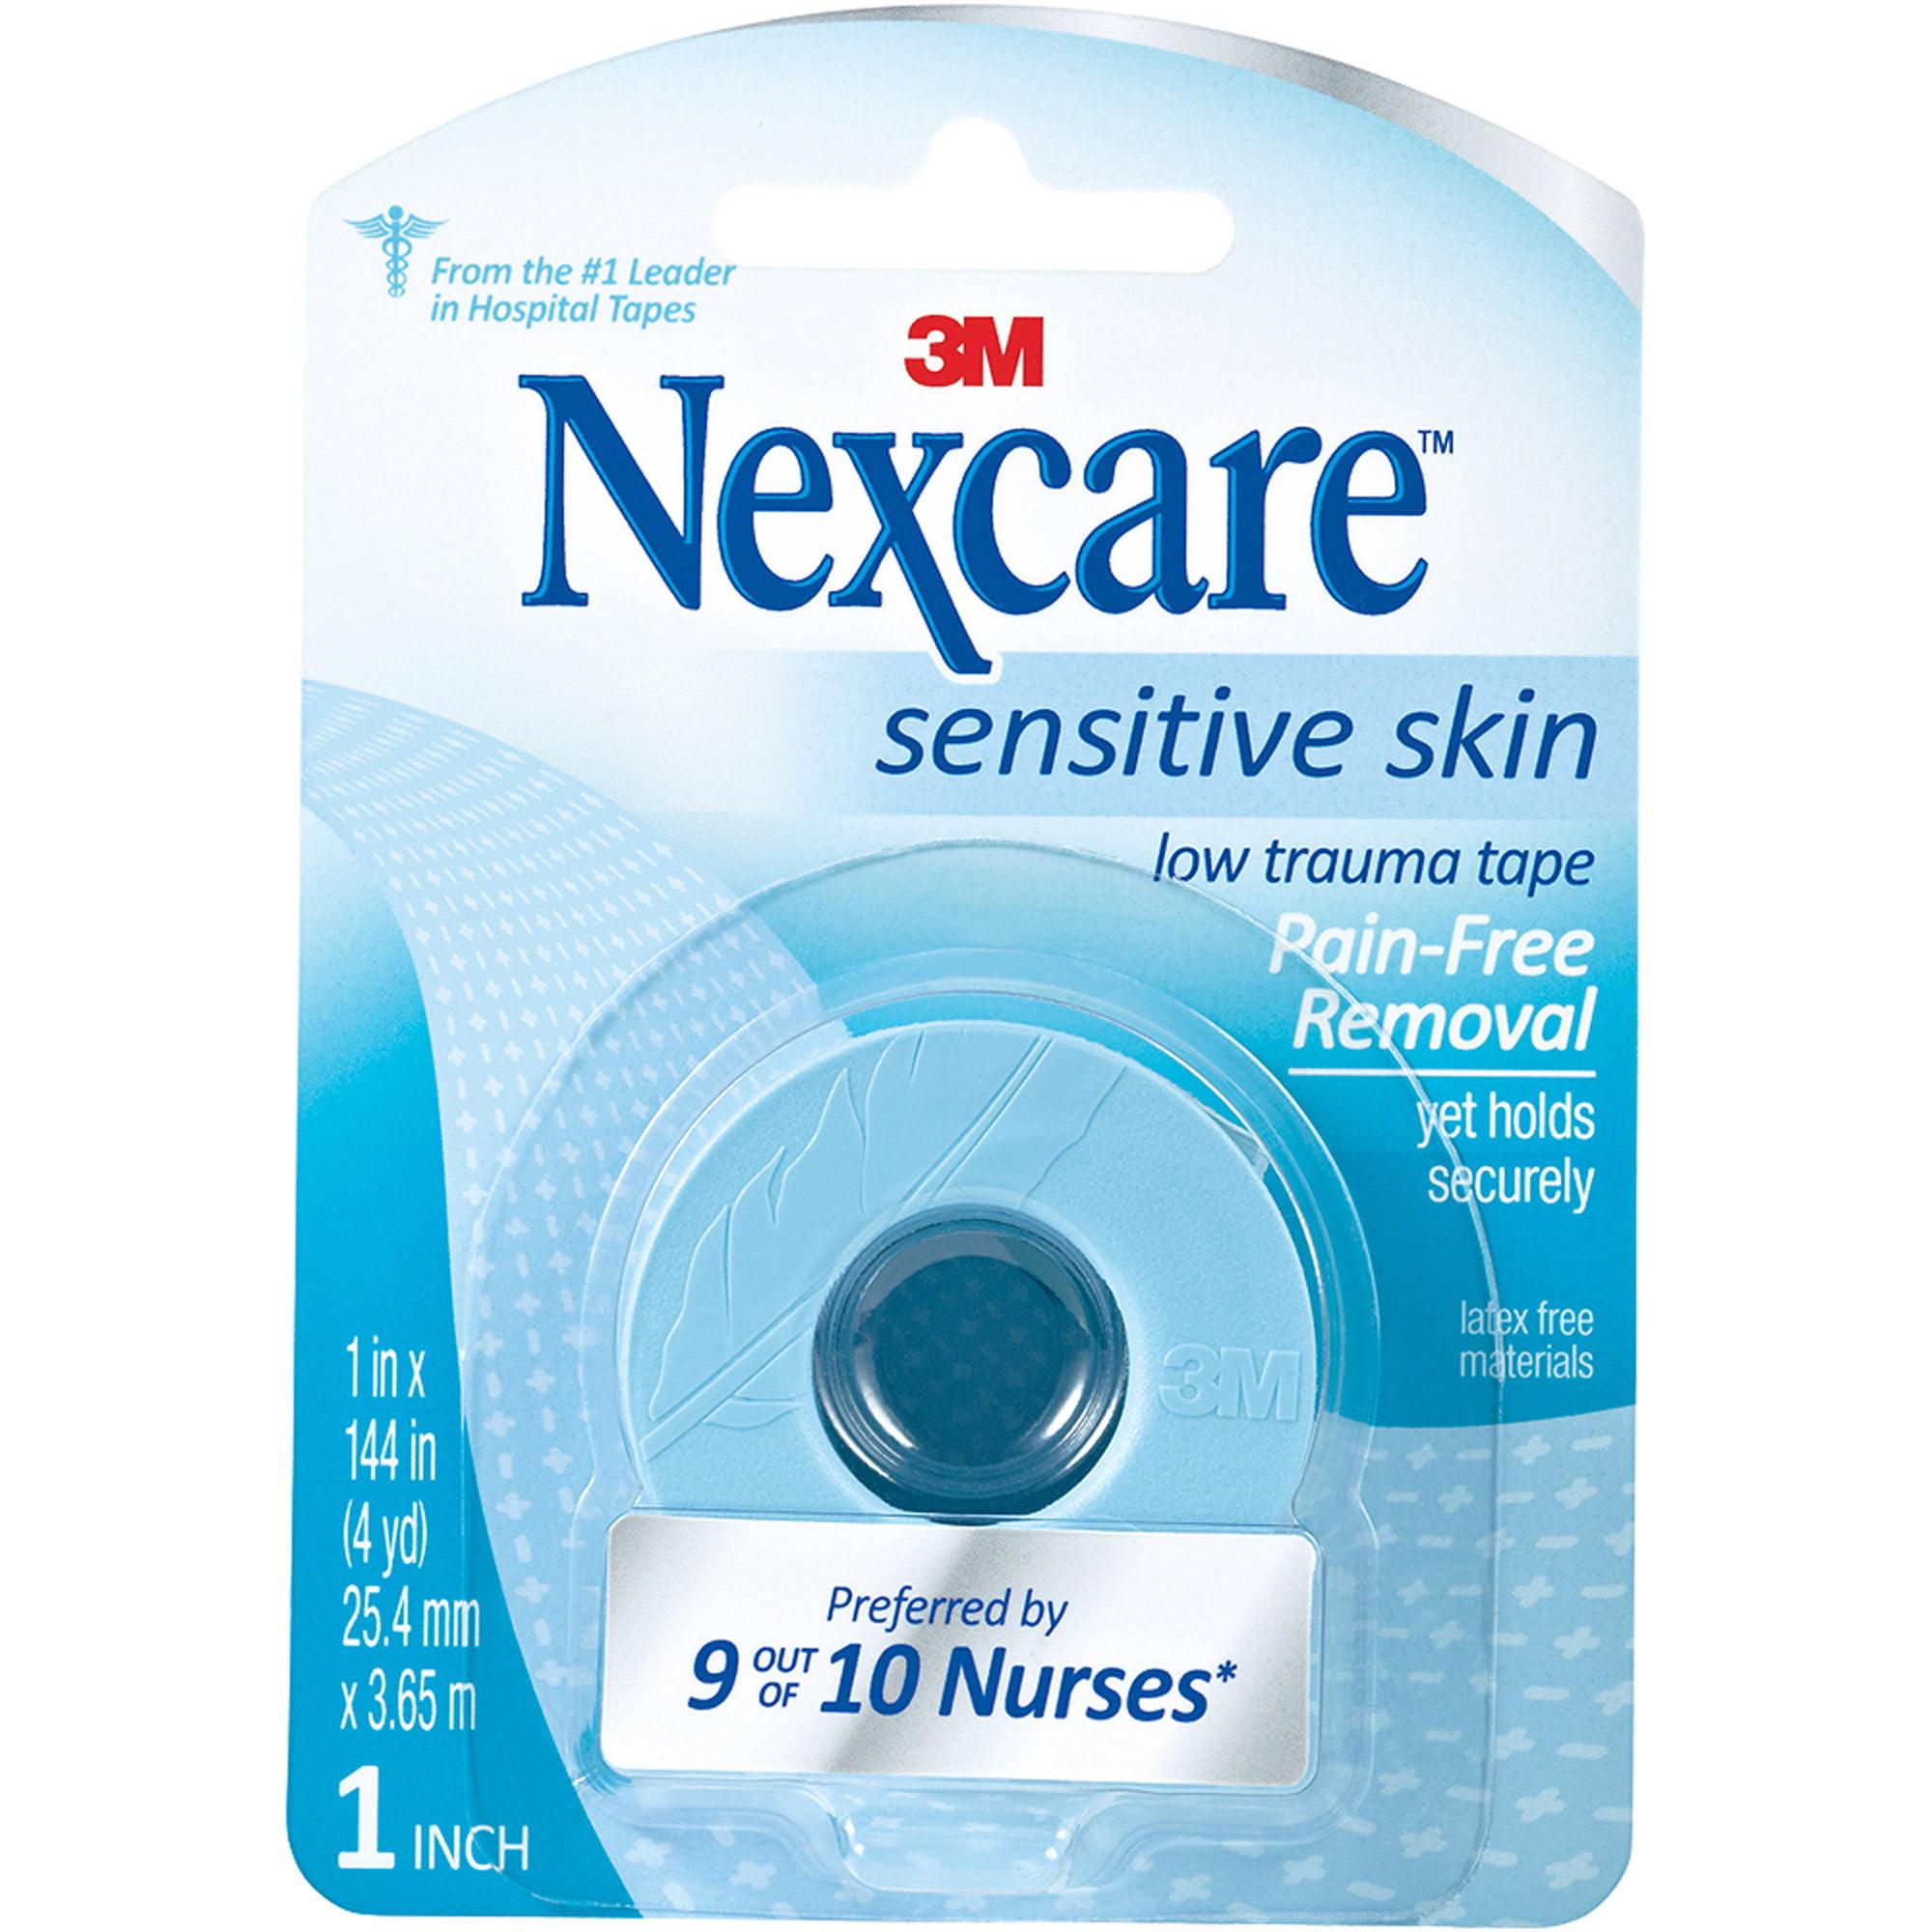 Nexcare Sensitive Skin Low Trauma Tape